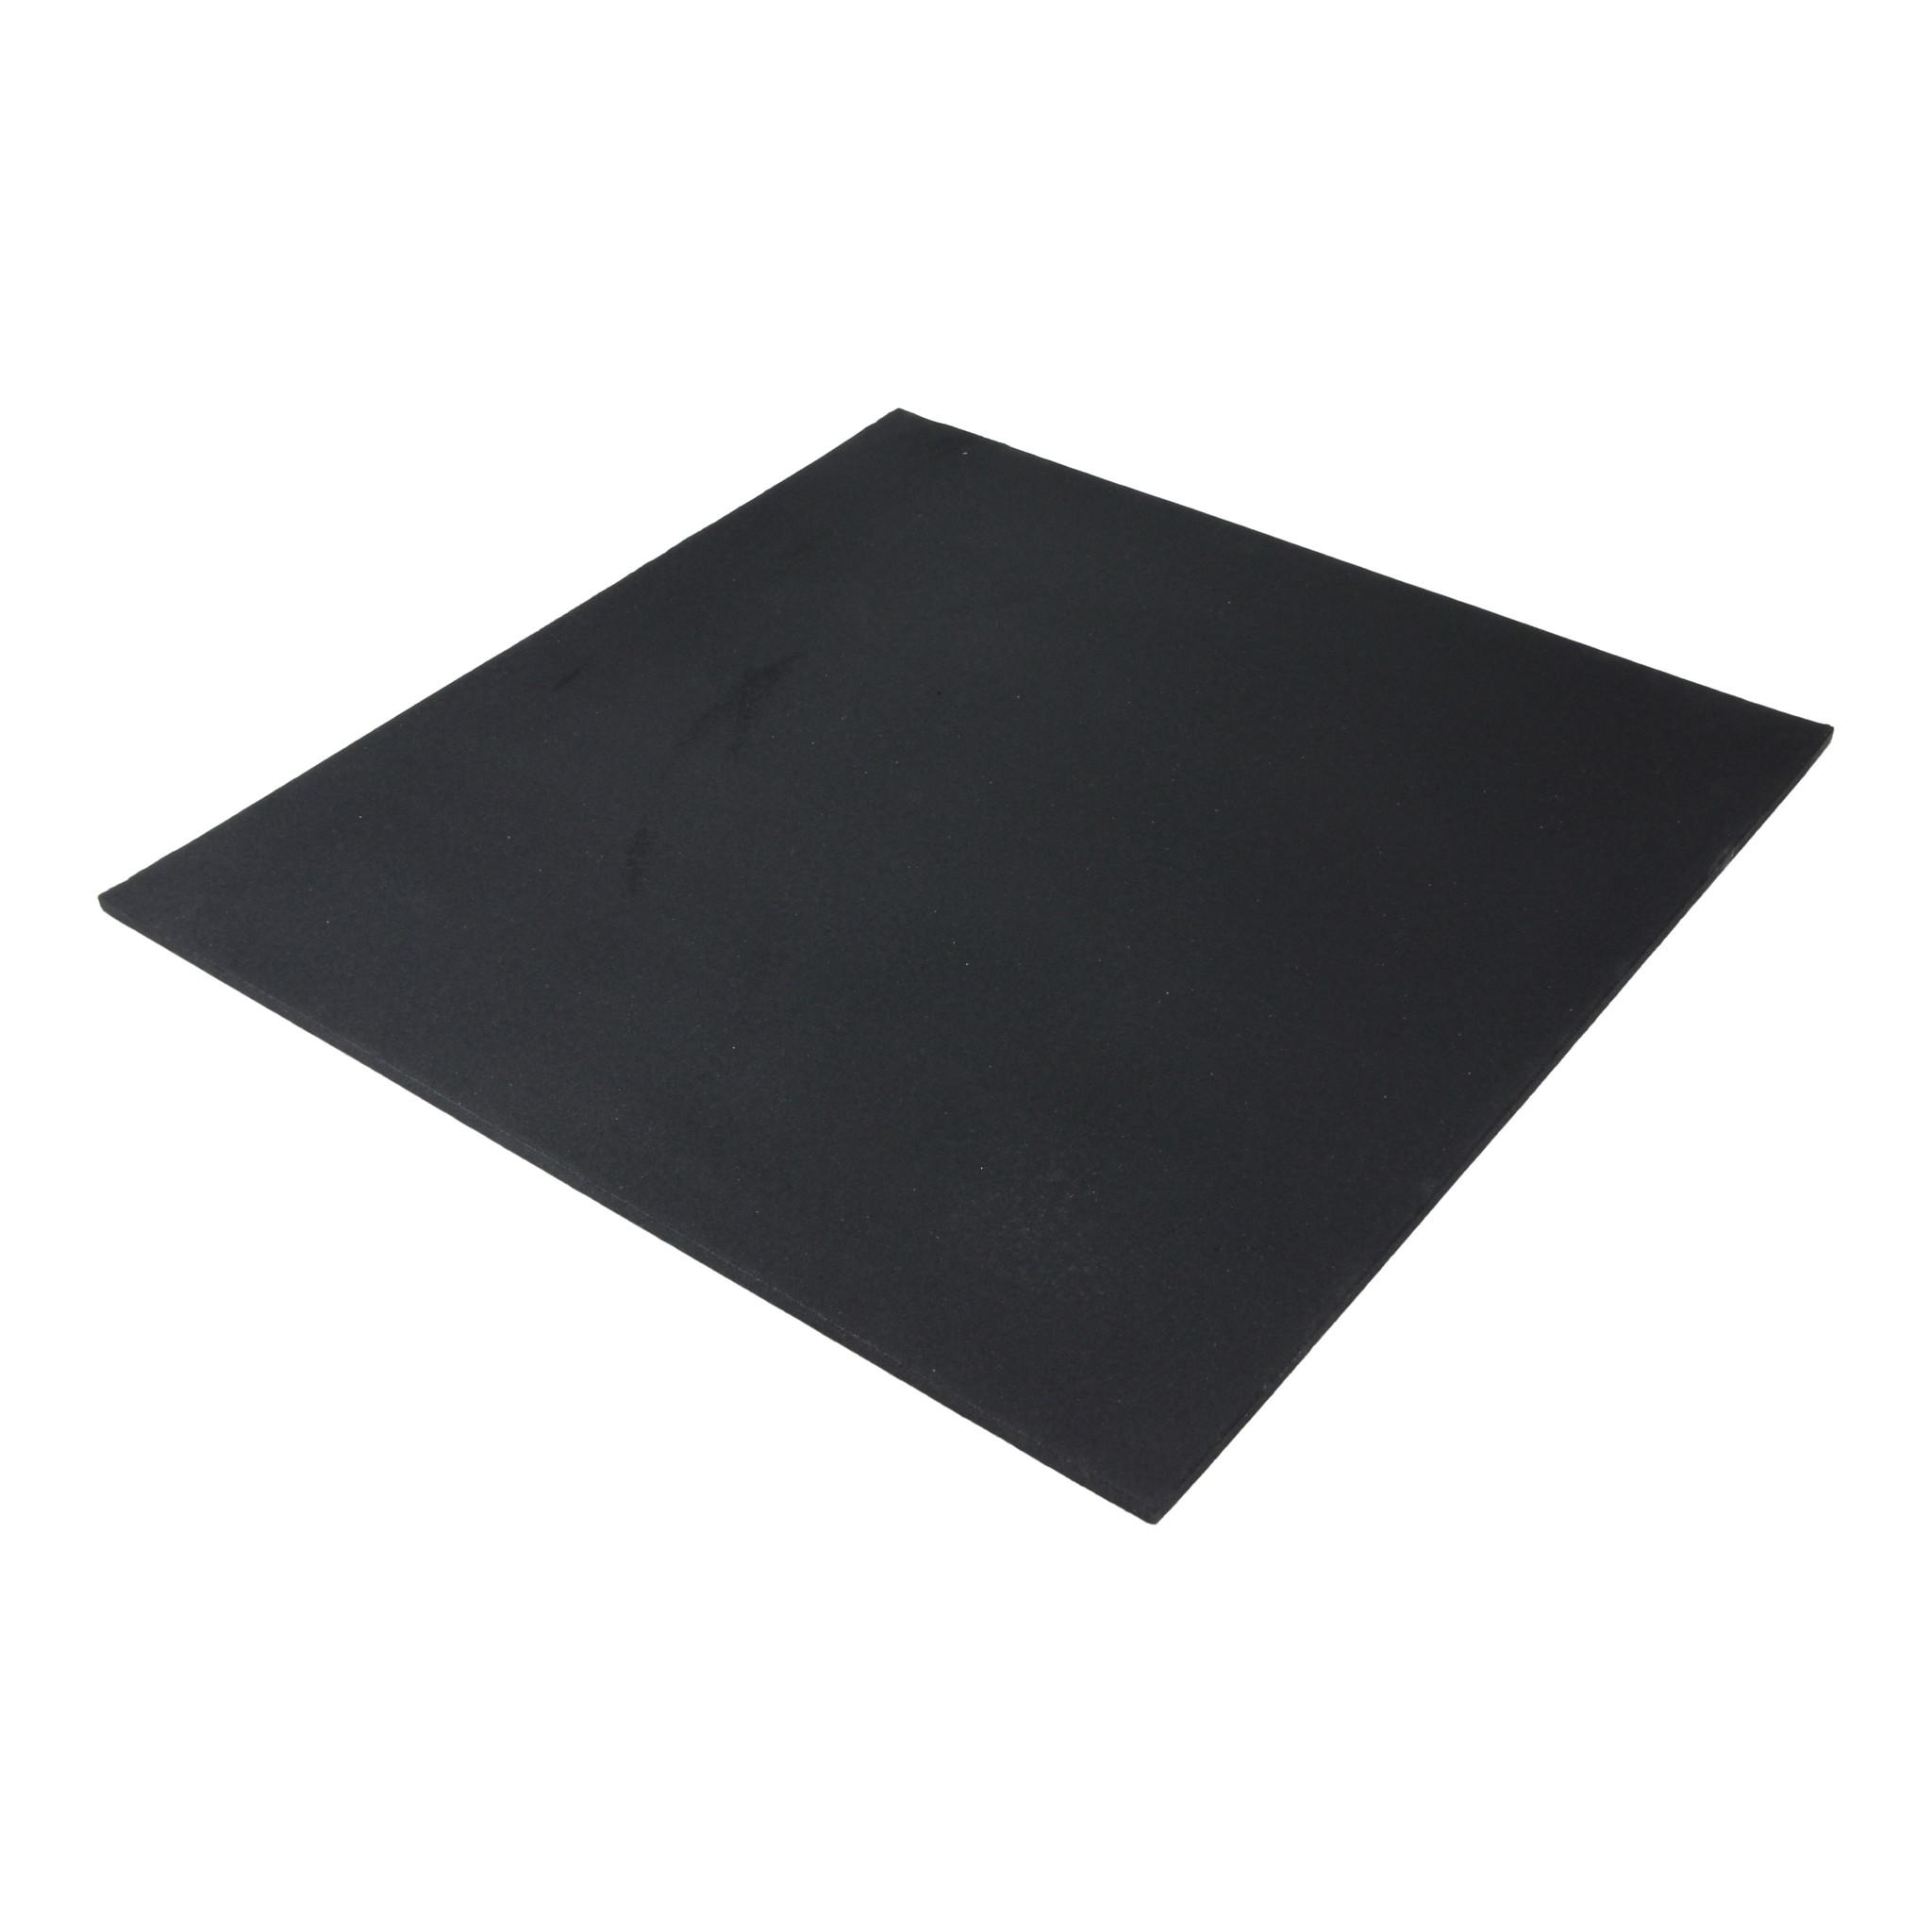 Lifemaxx® LMX1381 Rubber tile fine granulate 100x100x1,5cm